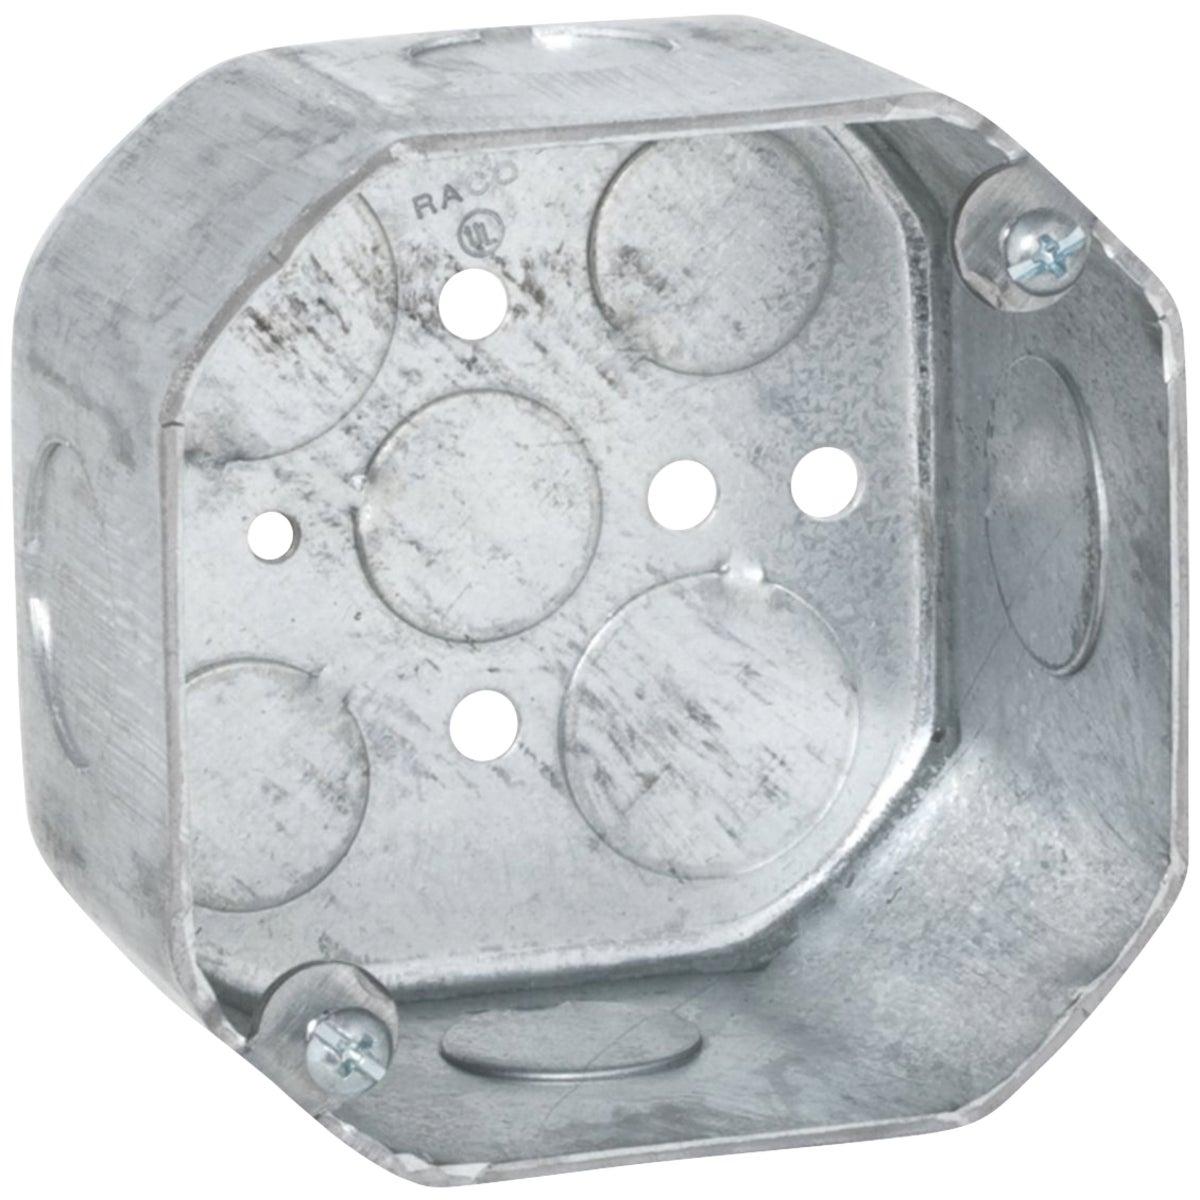 4X4X2-1/8 OCTAGON BOX - 541711/23/4 by Thomas & Betts